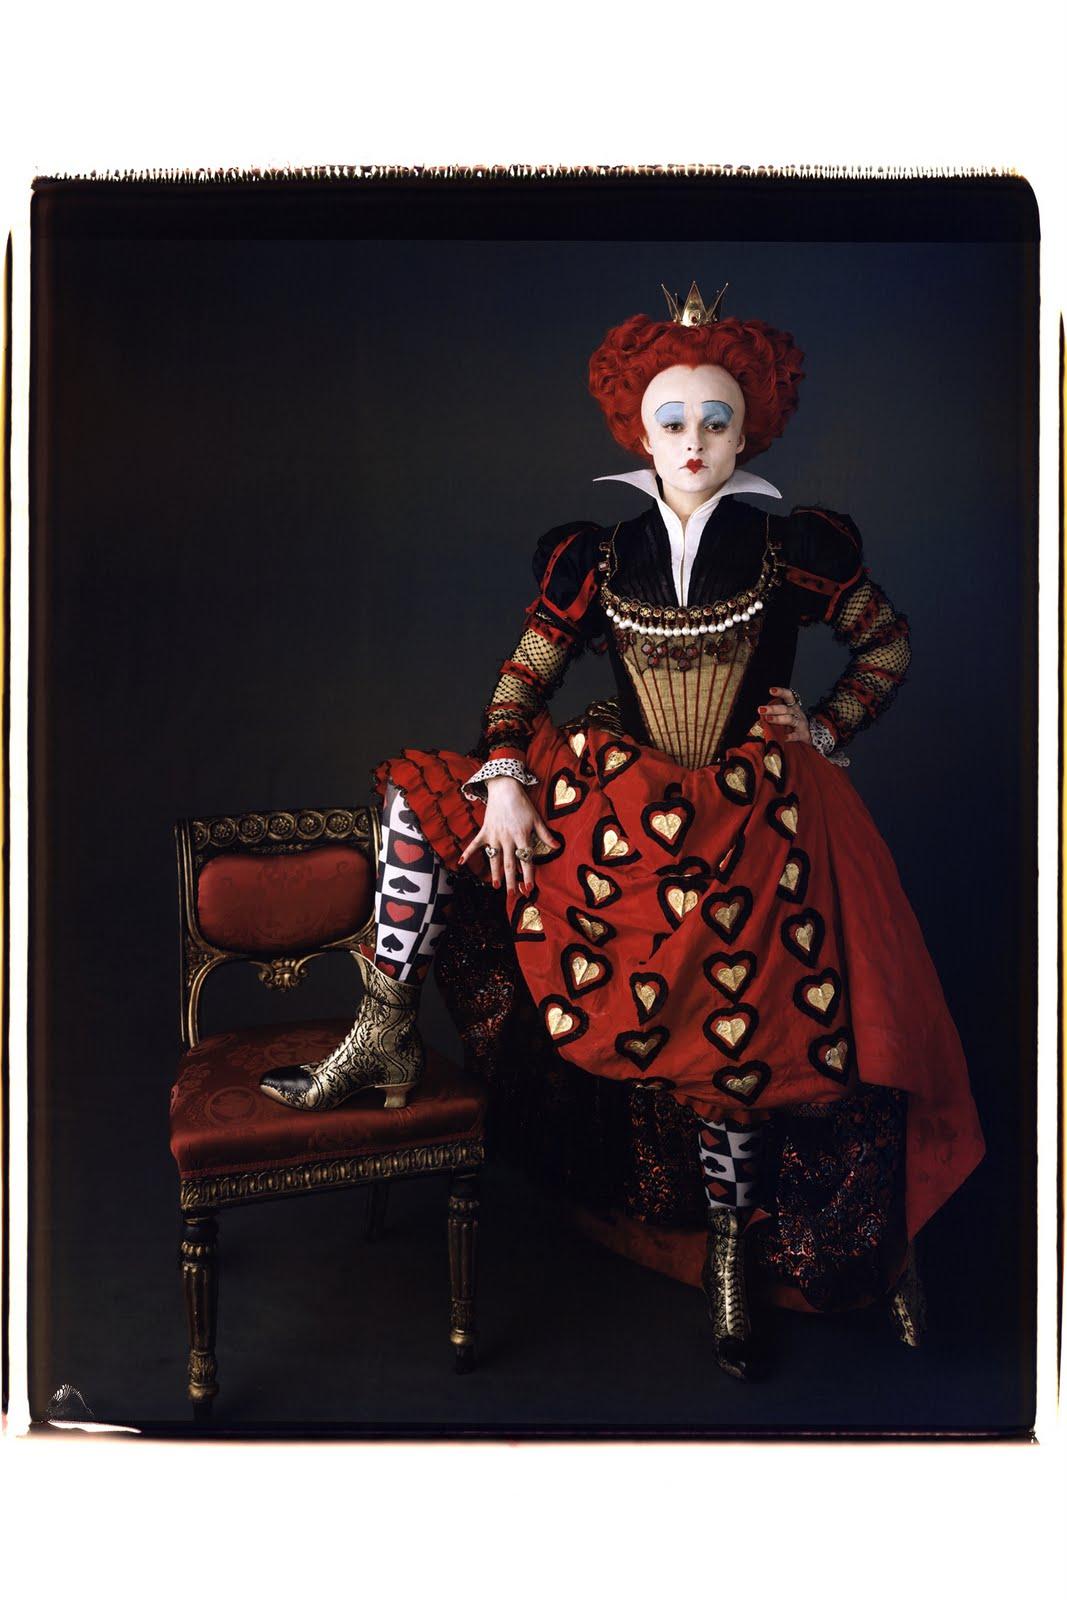 http://3.bp.blogspot.com/_baPhnmBaQVc/S8-WVJH9SfI/AAAAAAAAAJM/cu8-FPccHuc/s1600/helena-bonham-carter-in-alice-in-wonderland_vanity-fair.jpg